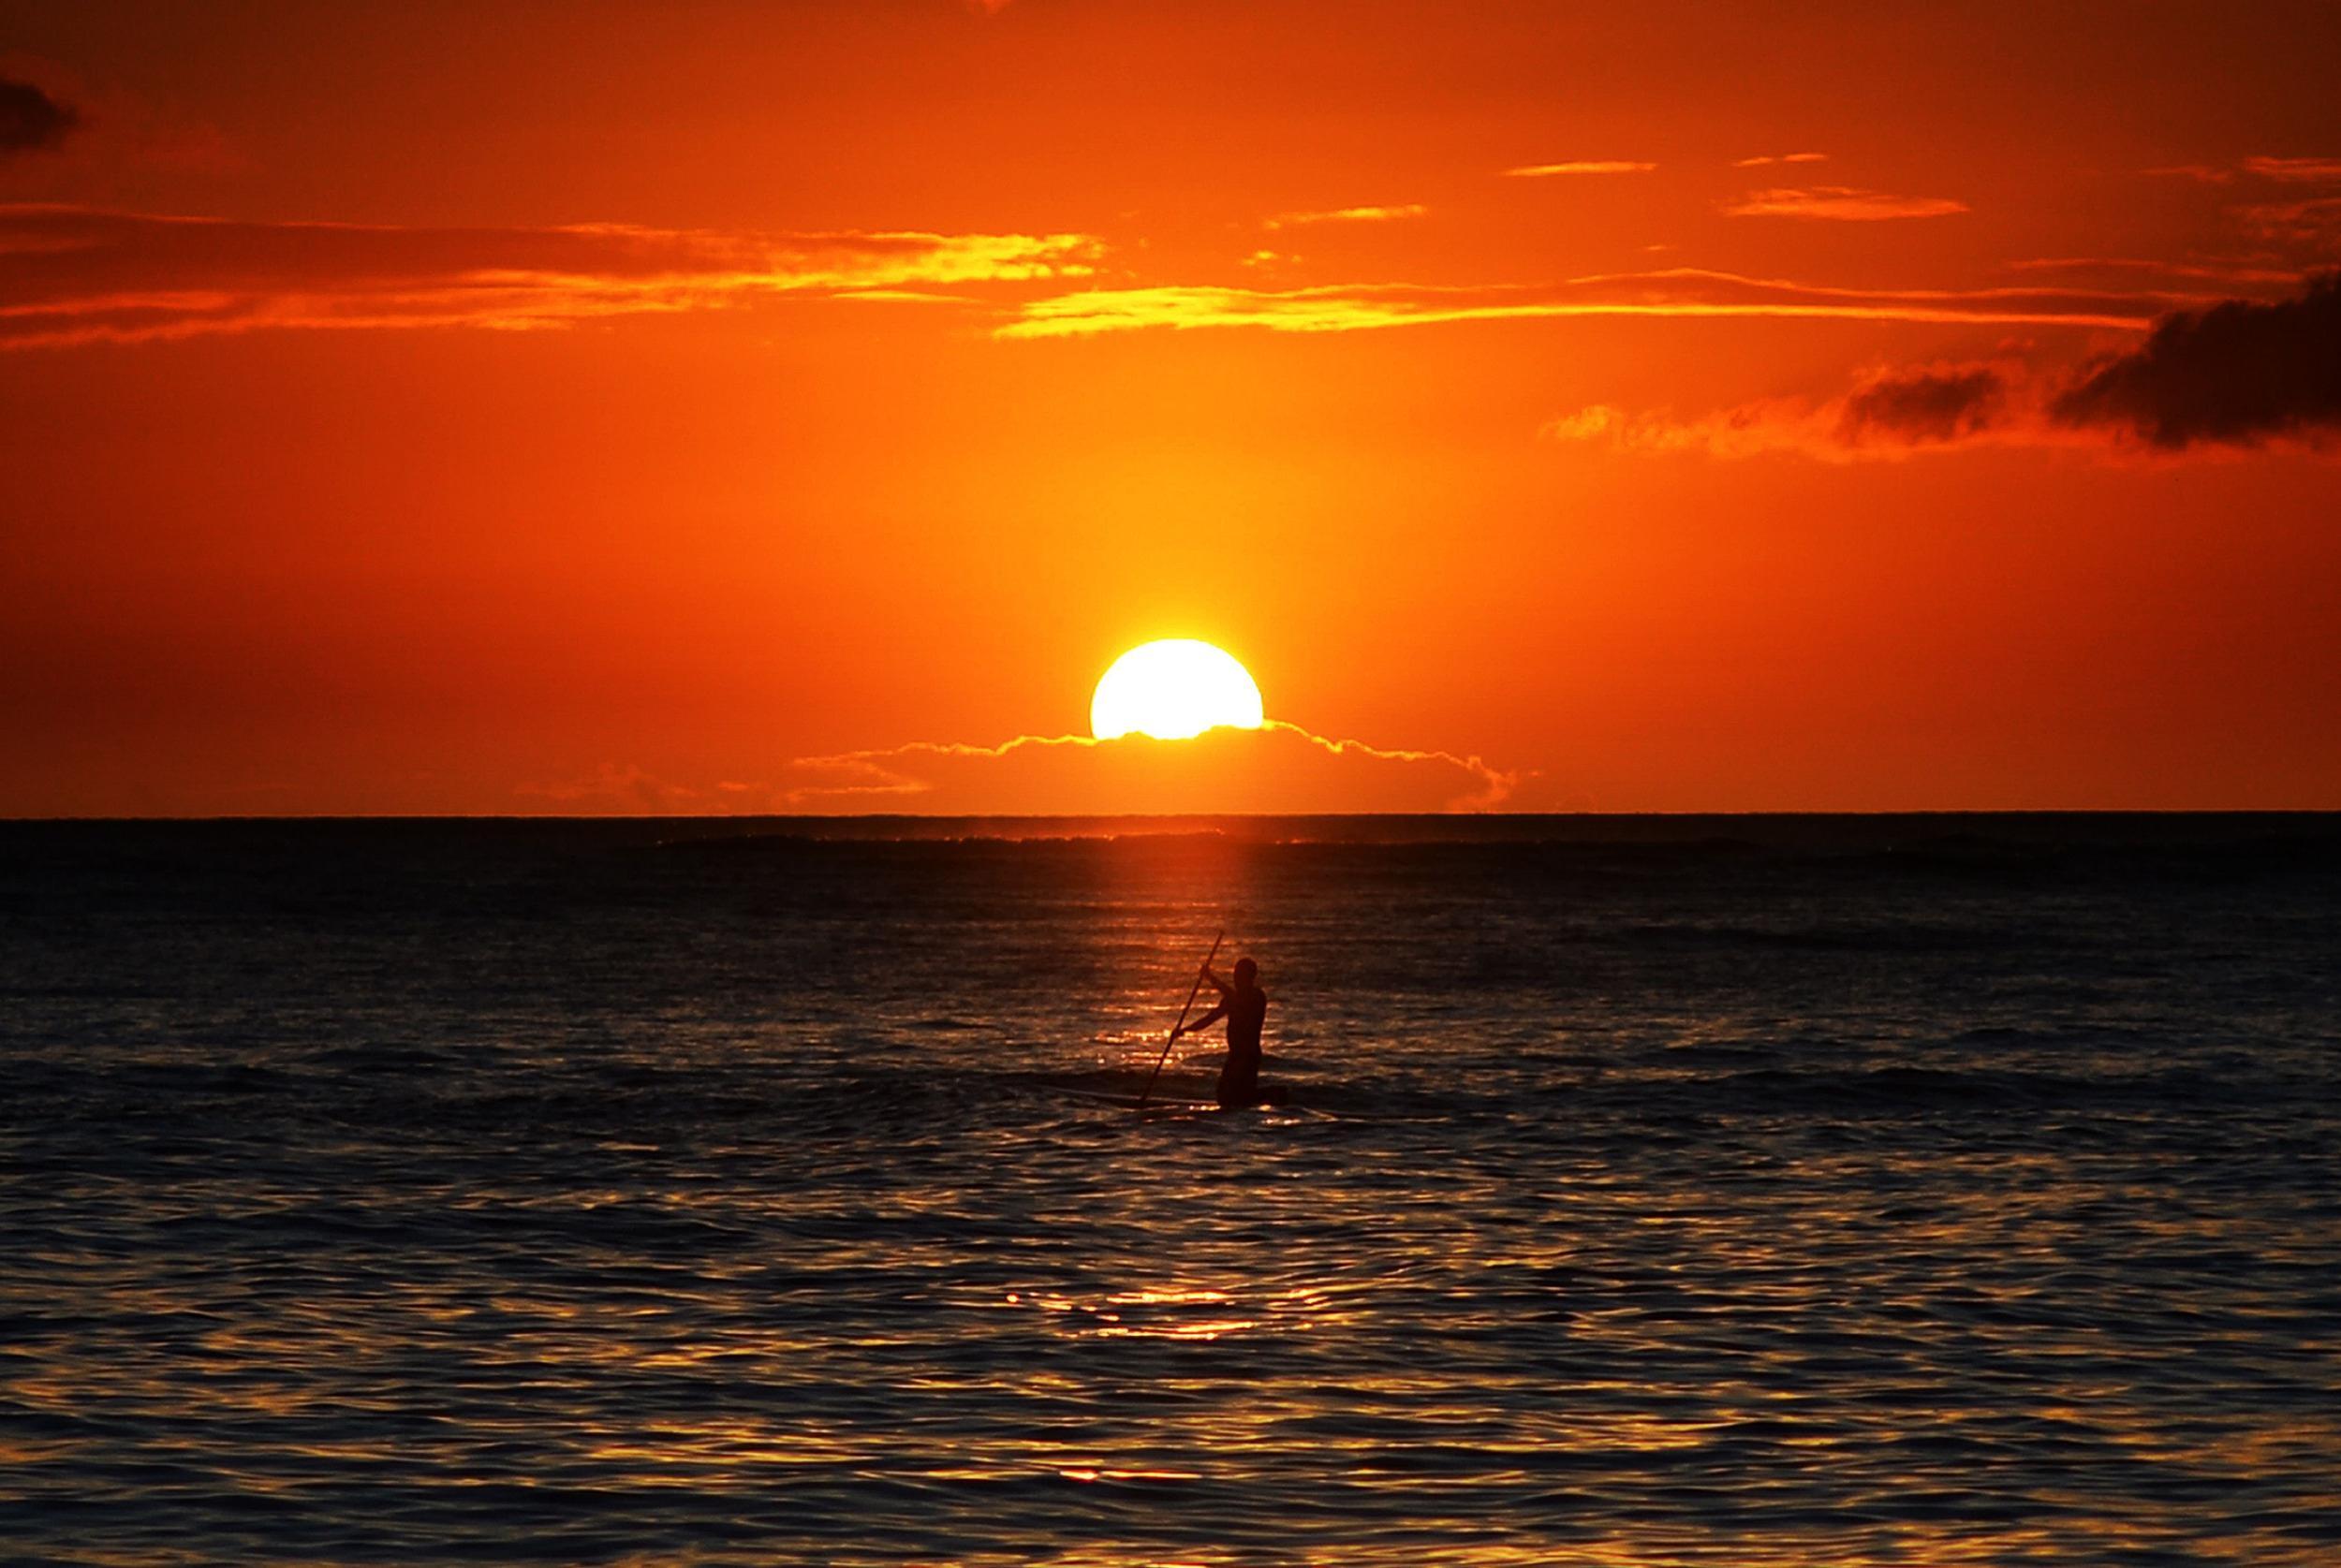 The sunset view from Waikiki beach in Honolulu, Hawaii